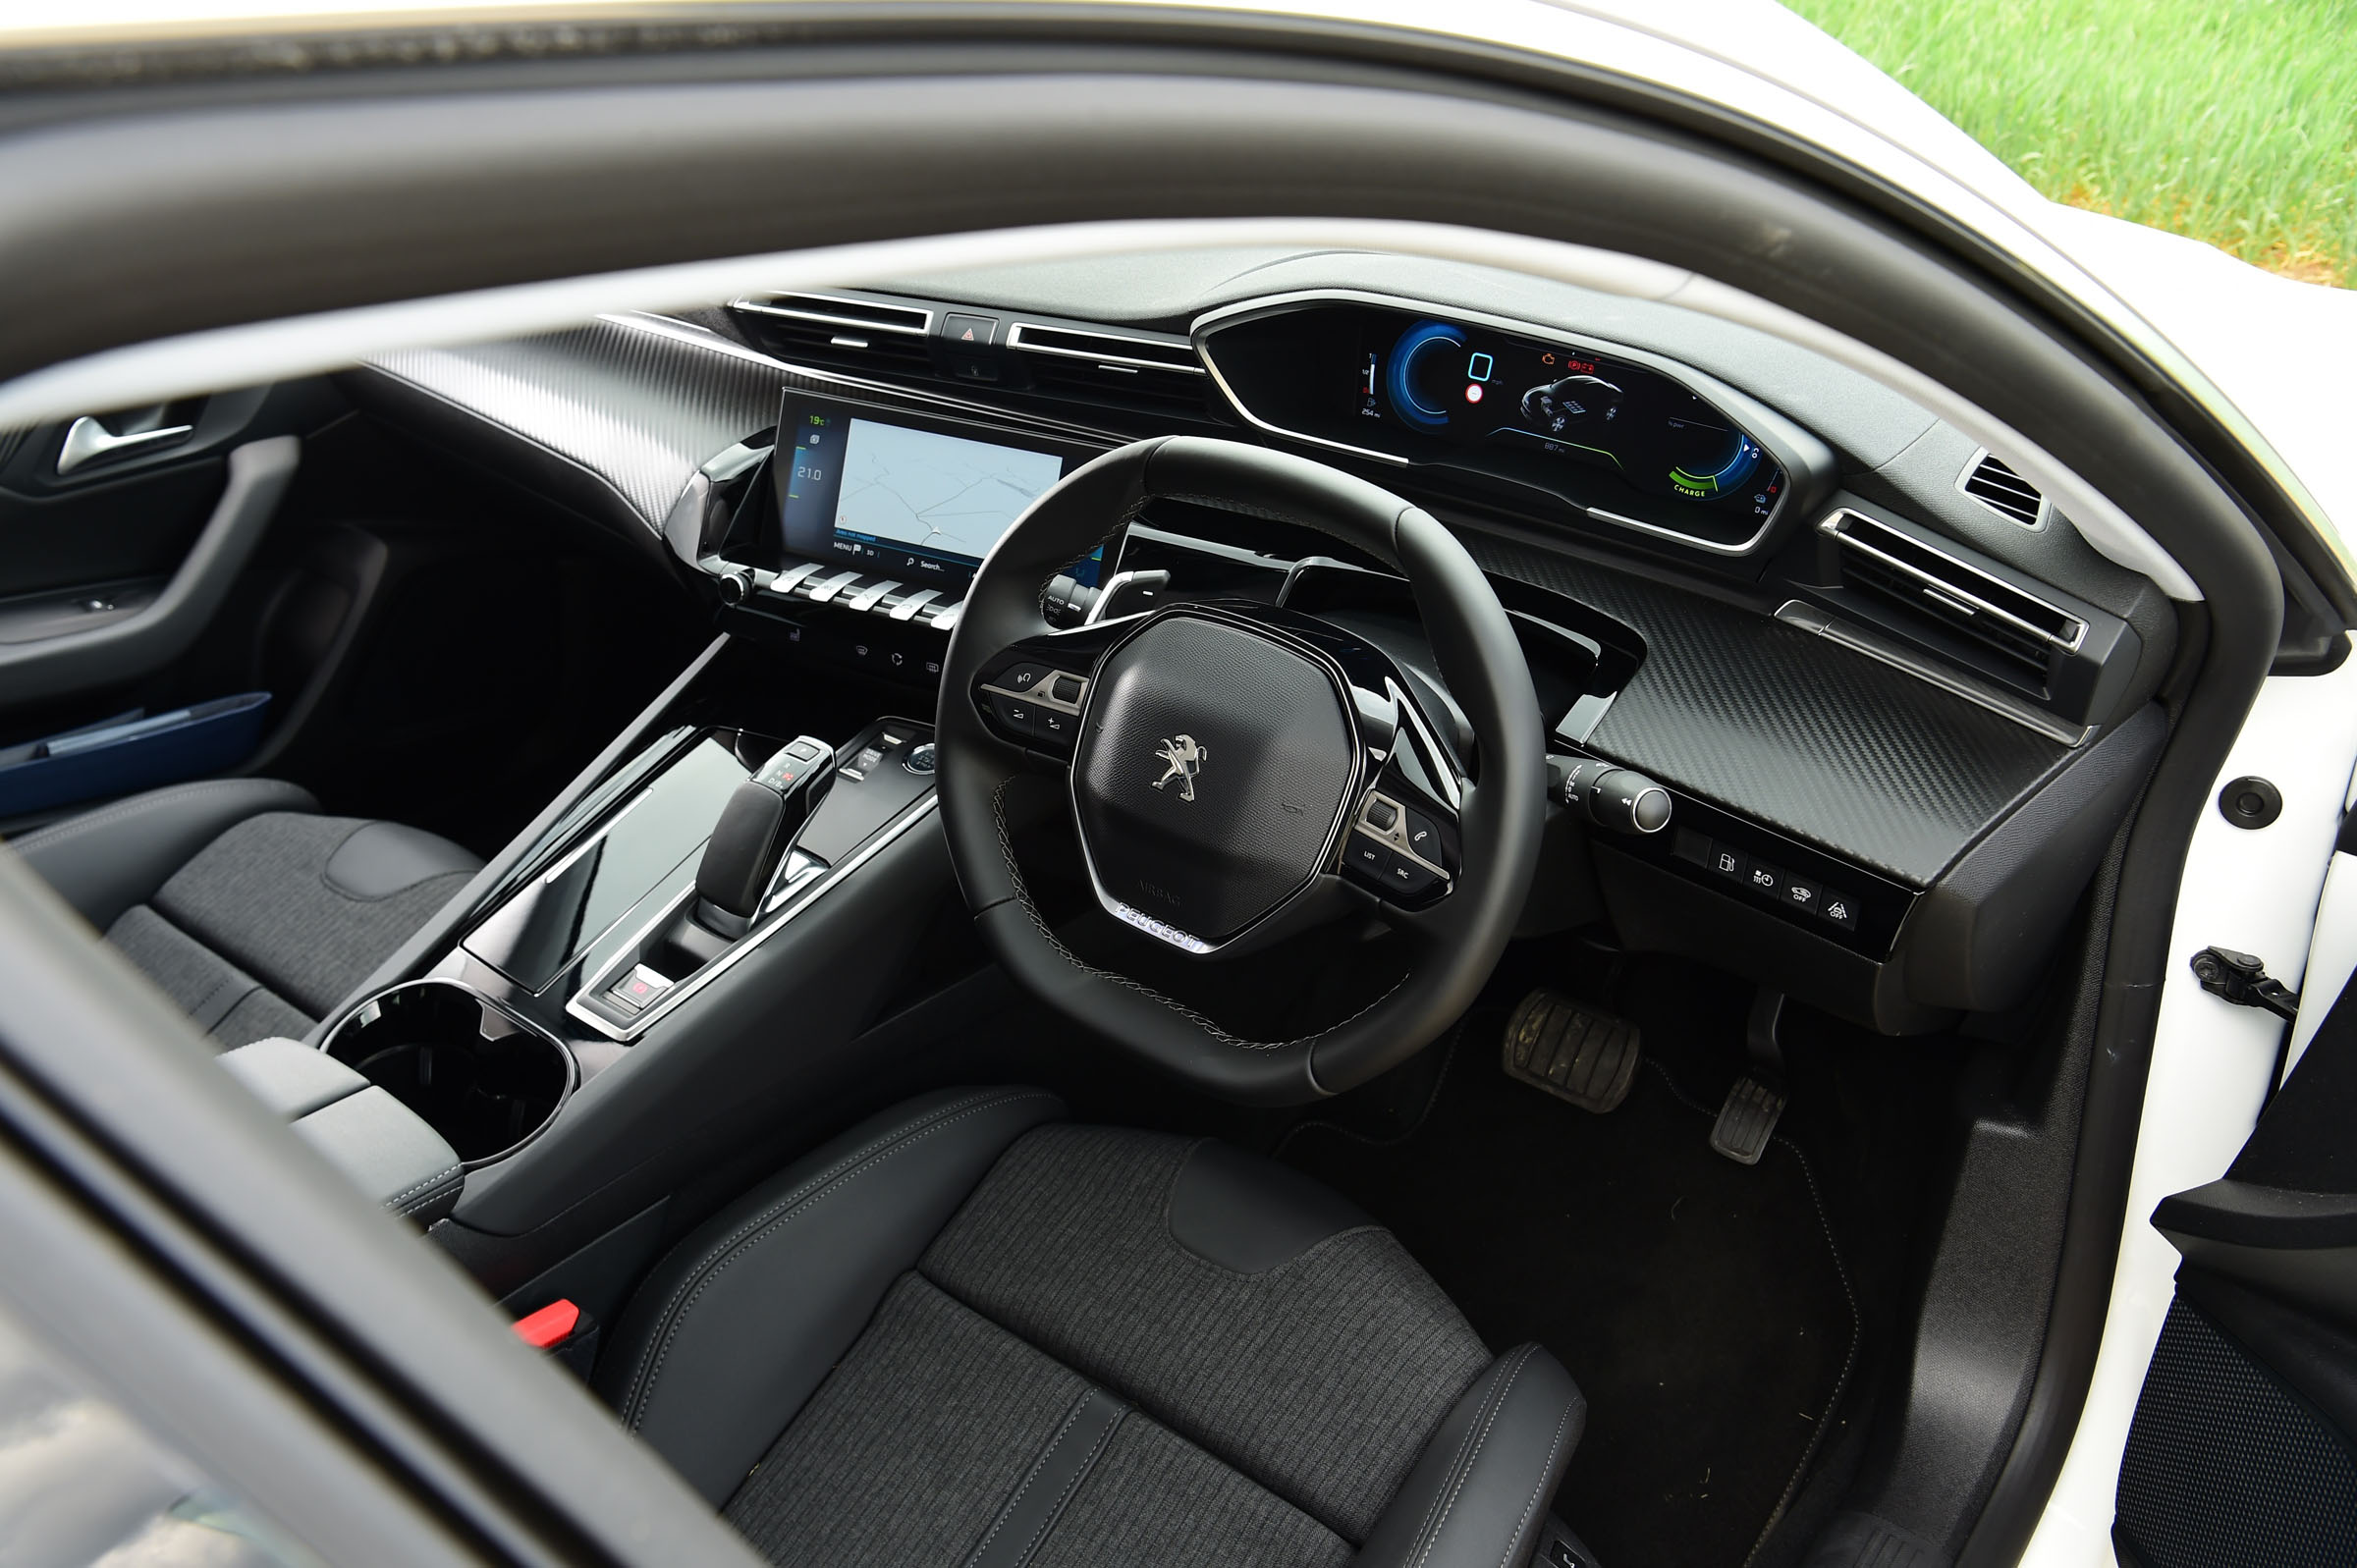 Peugeot 508 Hybrid Interior Comfort Drivingelectric